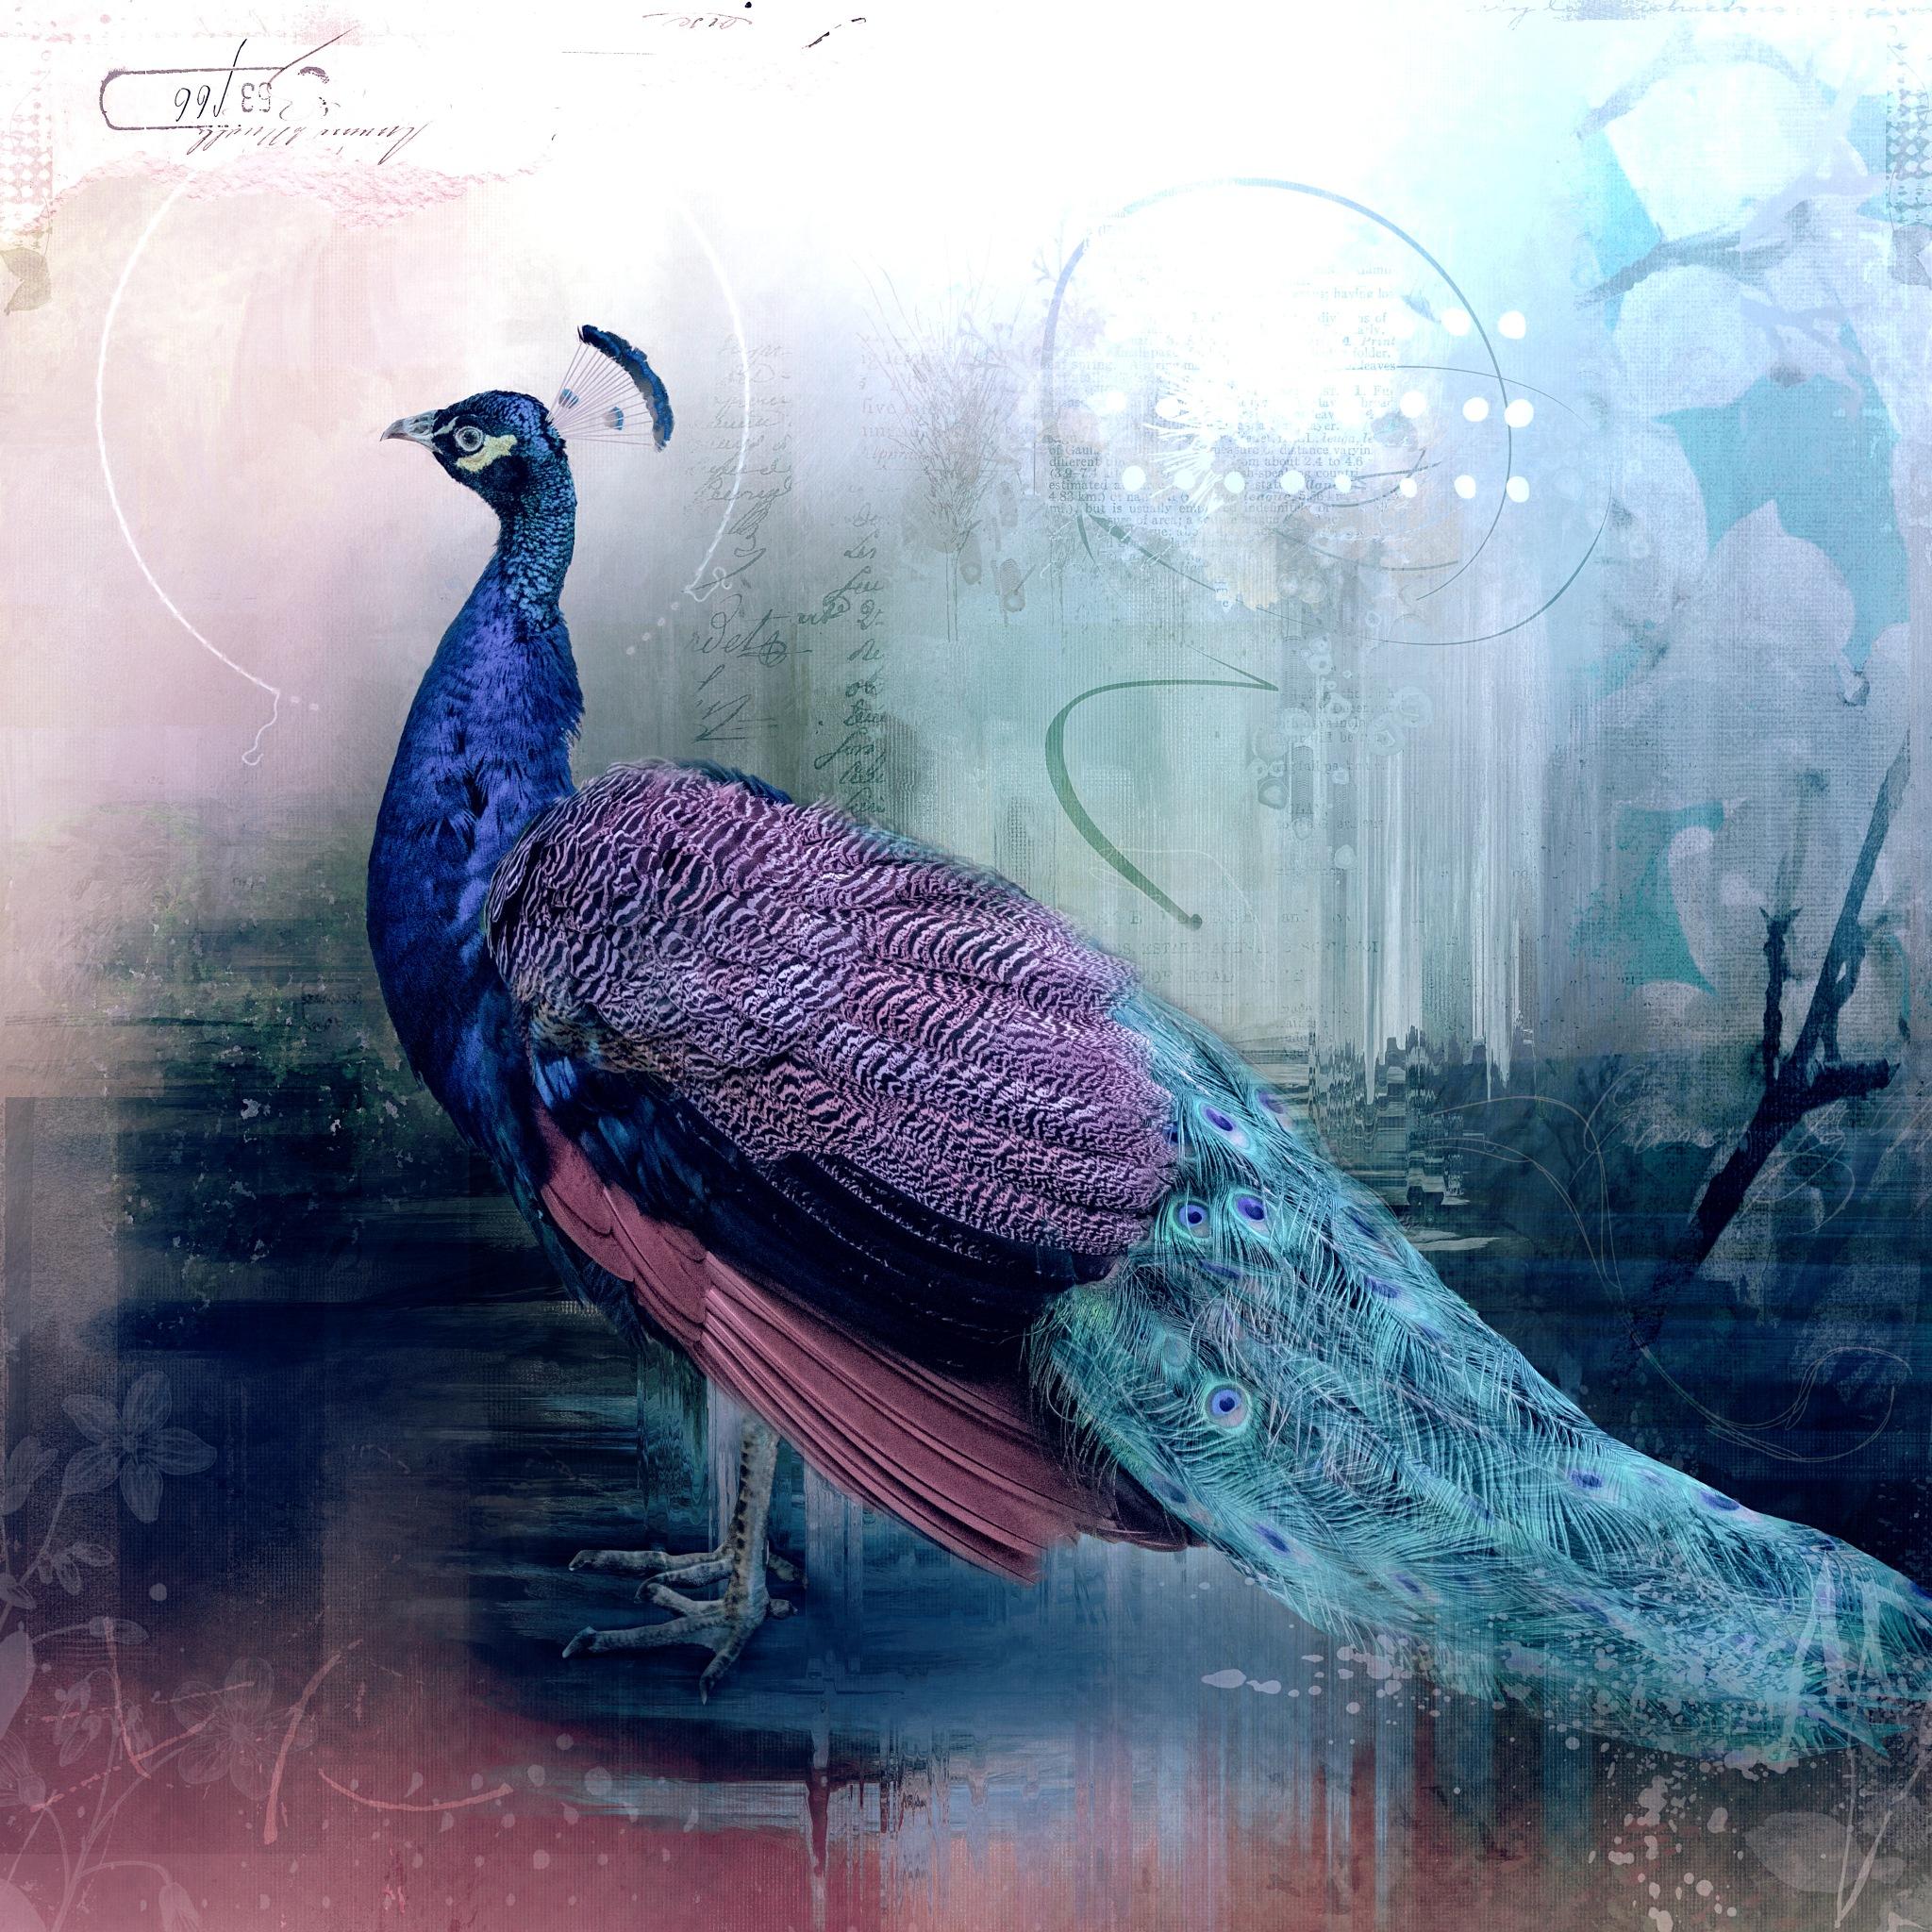 Be a Peacock by Cherbeni